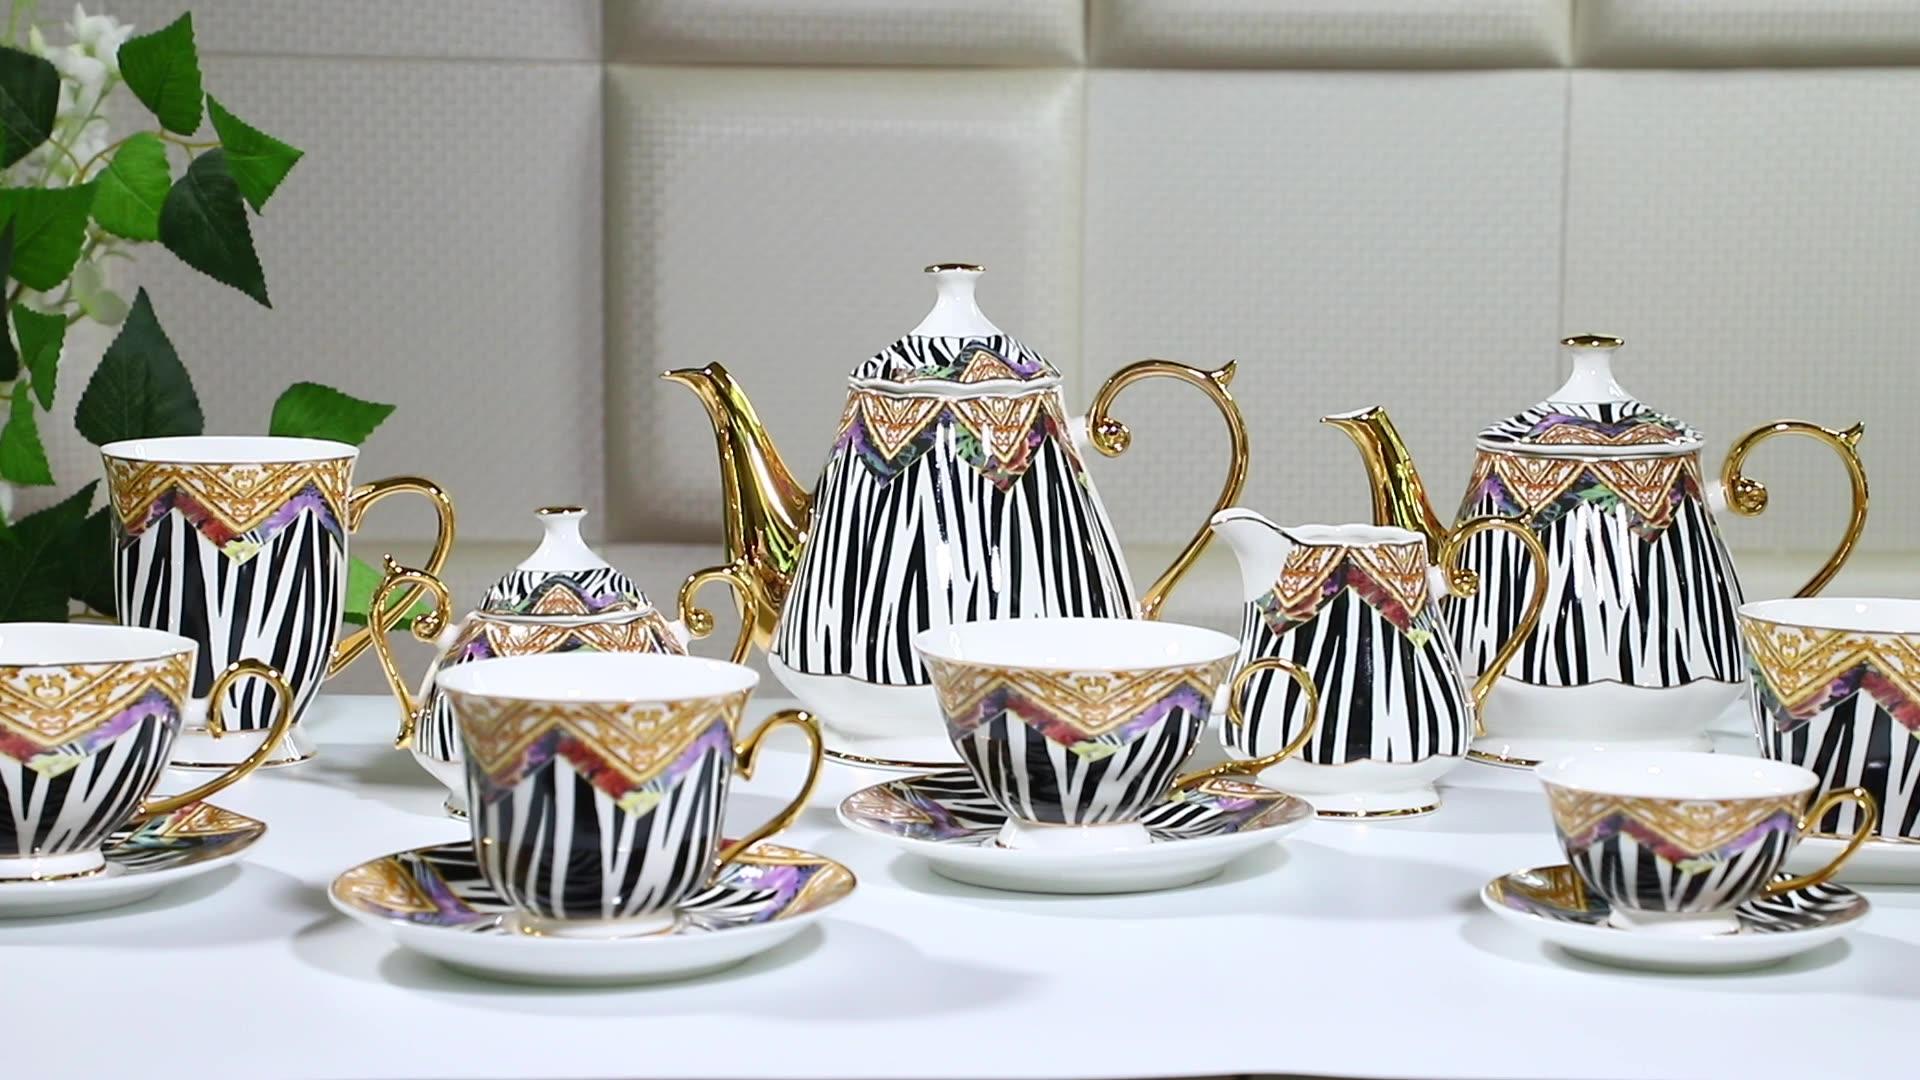 Full deca design royal style new bone coffee cup saucer ceramic tea set